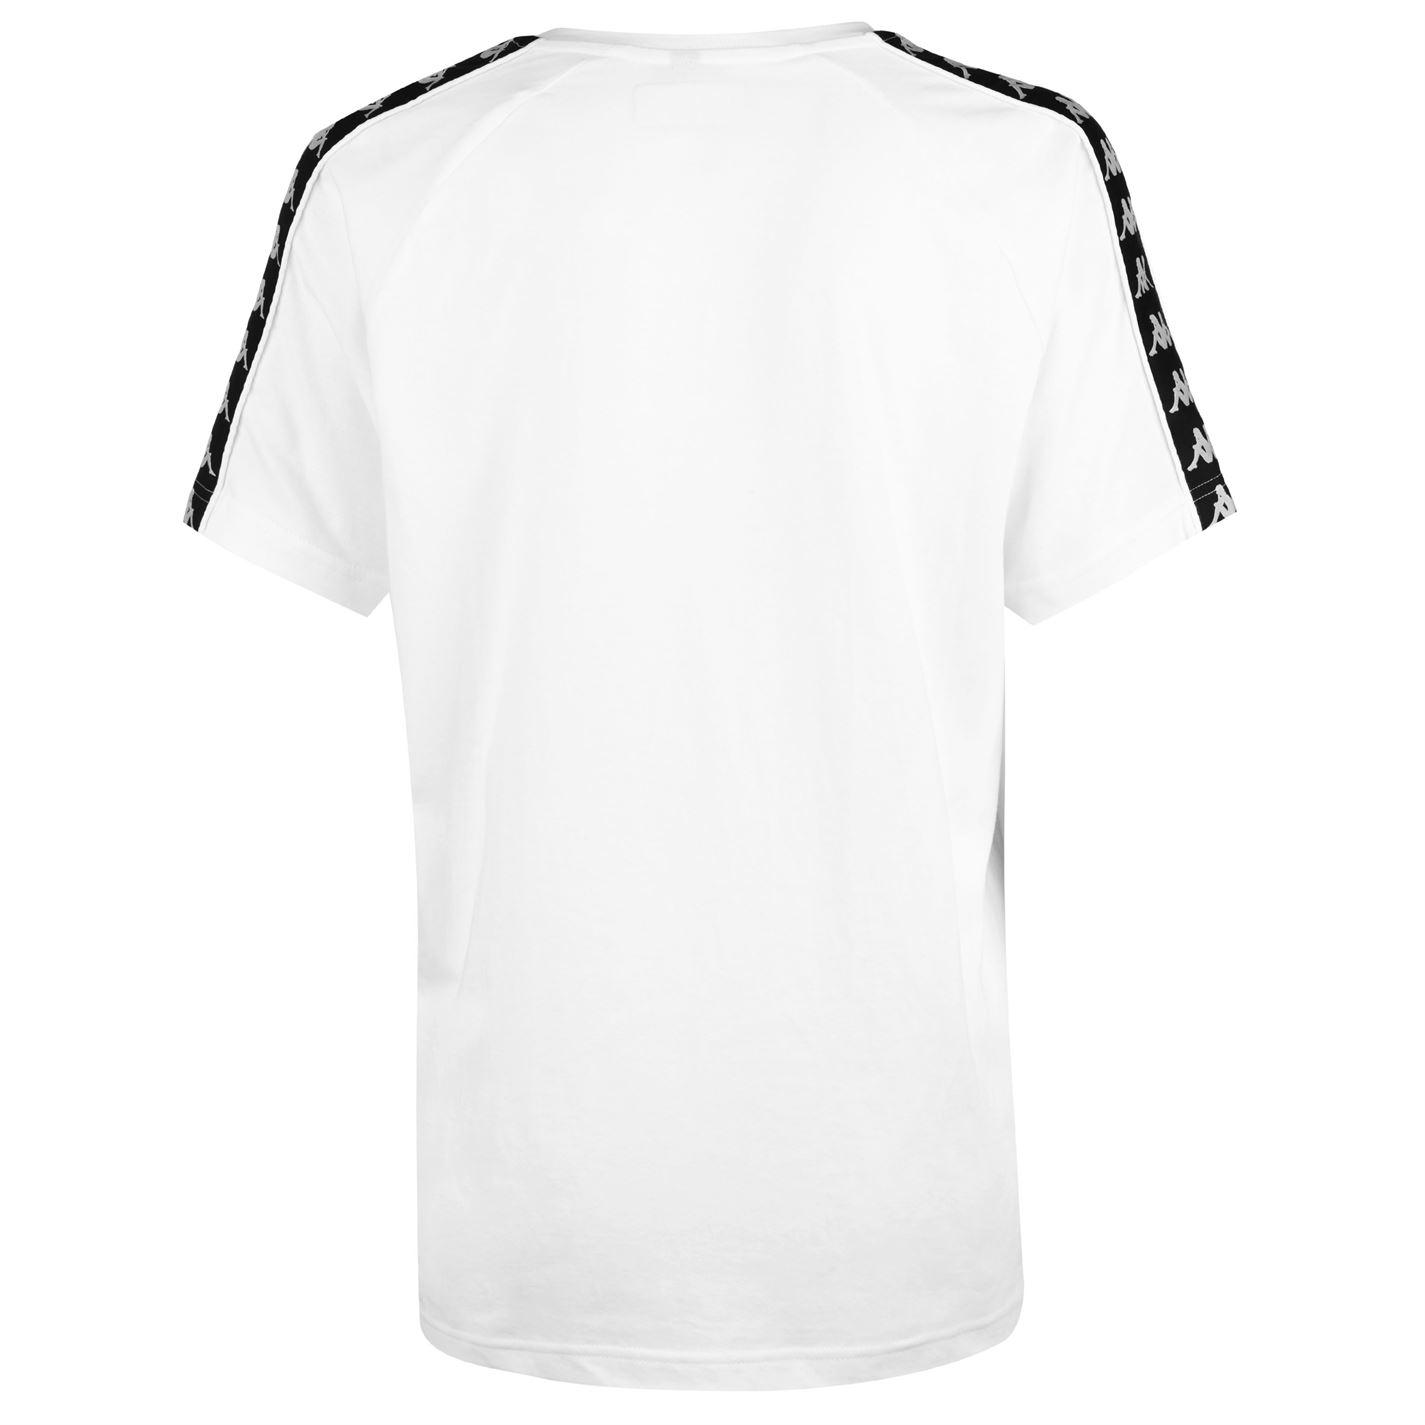 82219aec Womens Kappa Banda Coen Slim T Shirt Crew Neck Short Sleeve New | eBay